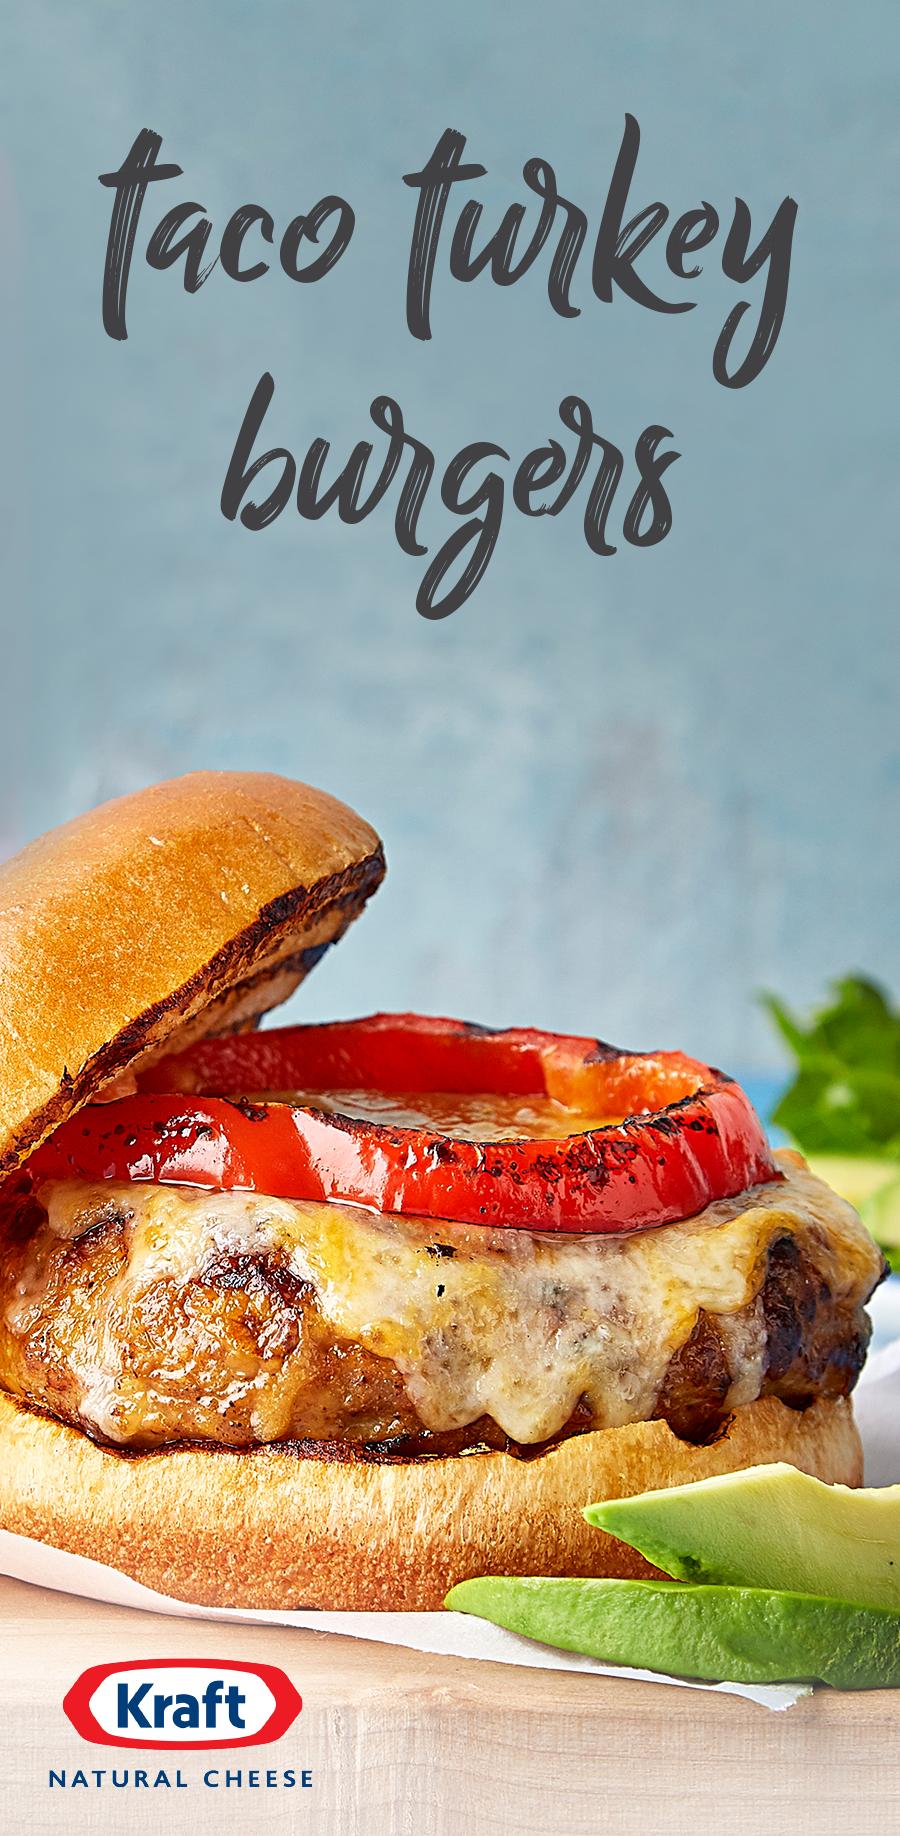 Taco Turkey Burgers Recipe Turkey Burger Recipes Recipes Food